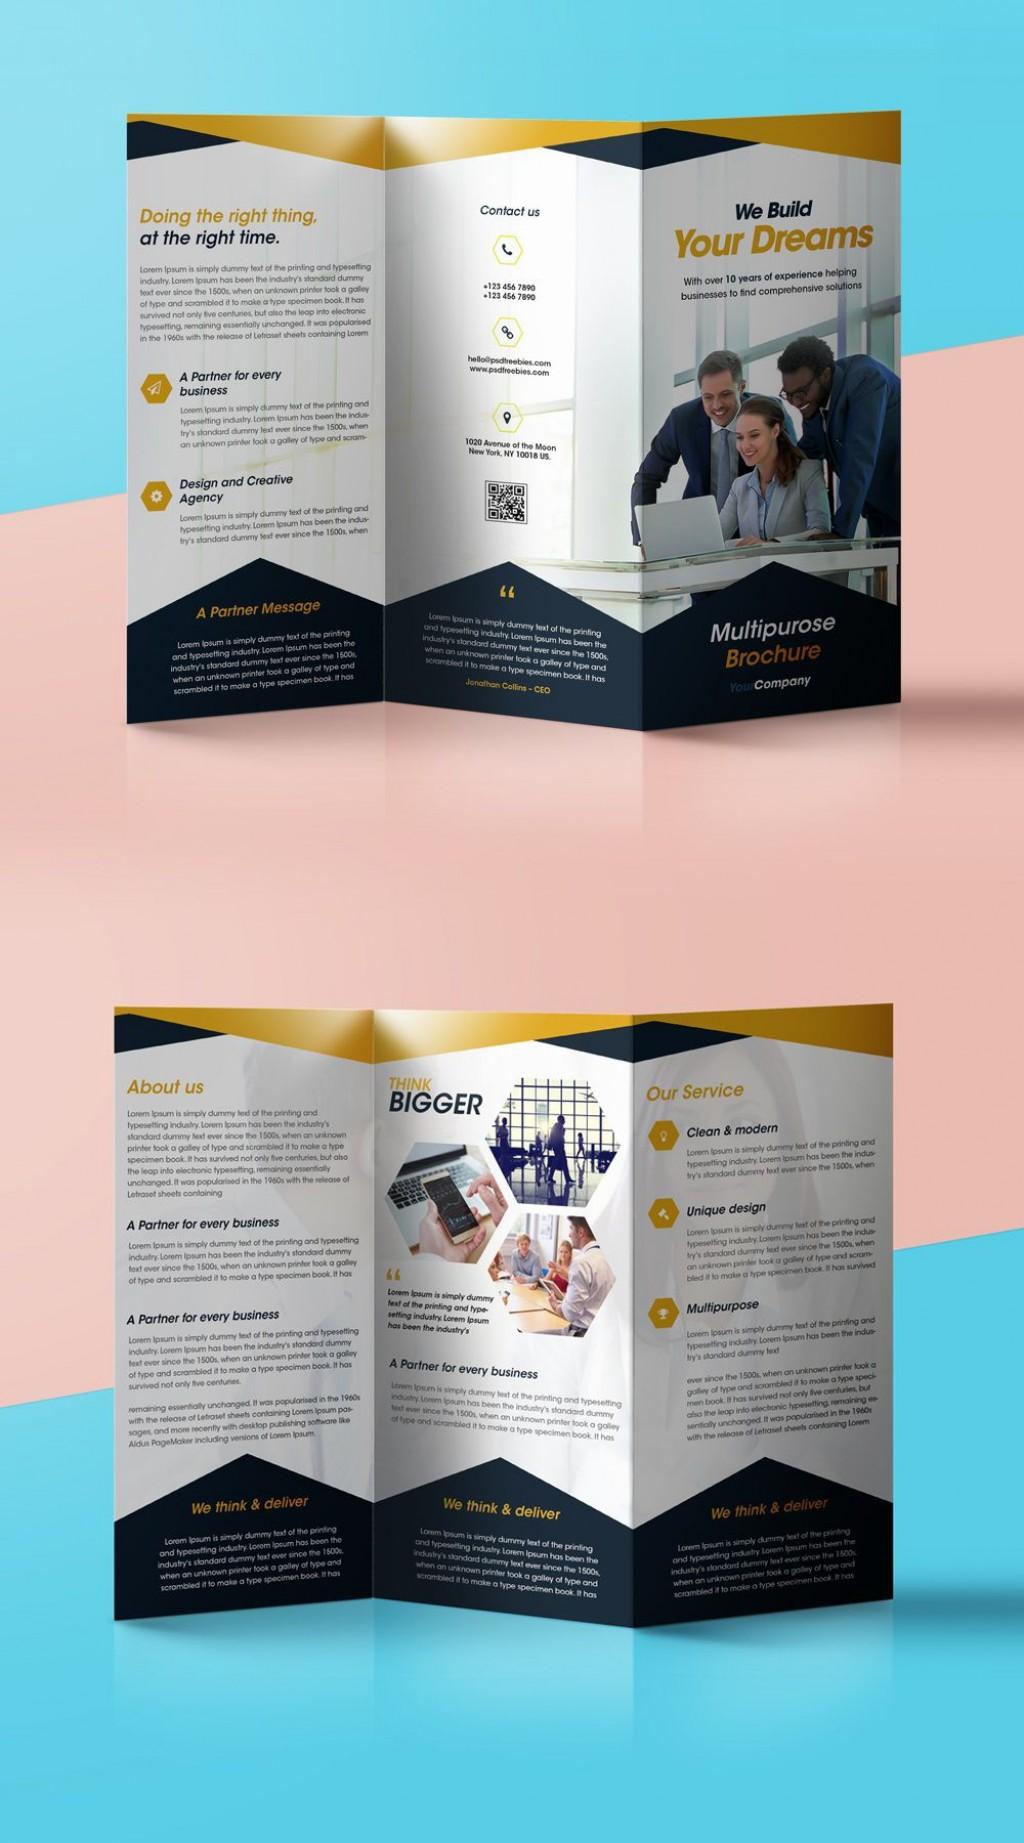 008 Fearsome Free Tri Fold Brochure Template Photo  Photoshop Illustrator Microsoft Word 2010Large